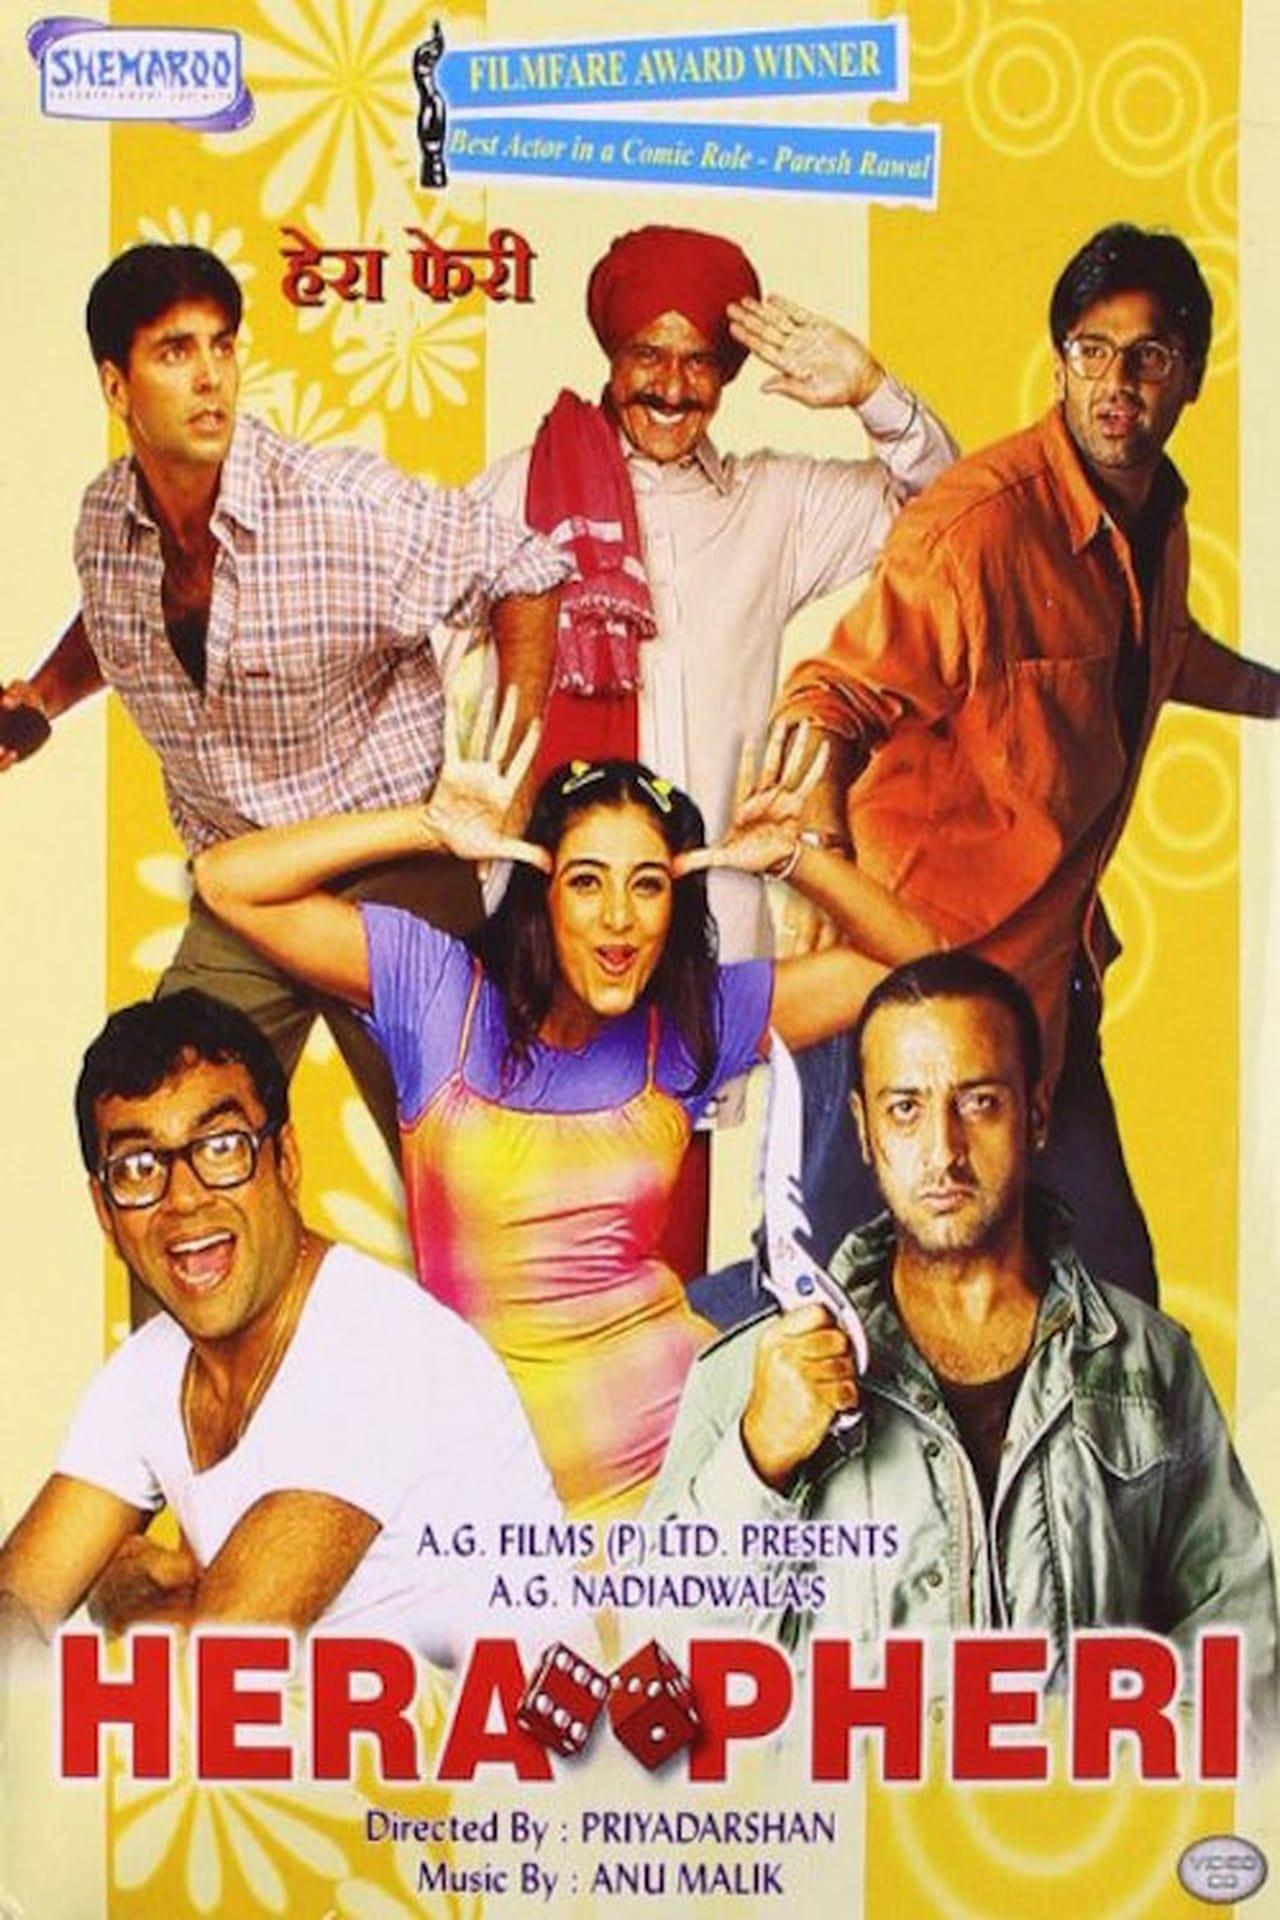 hera pheri one of the popular comedy movies